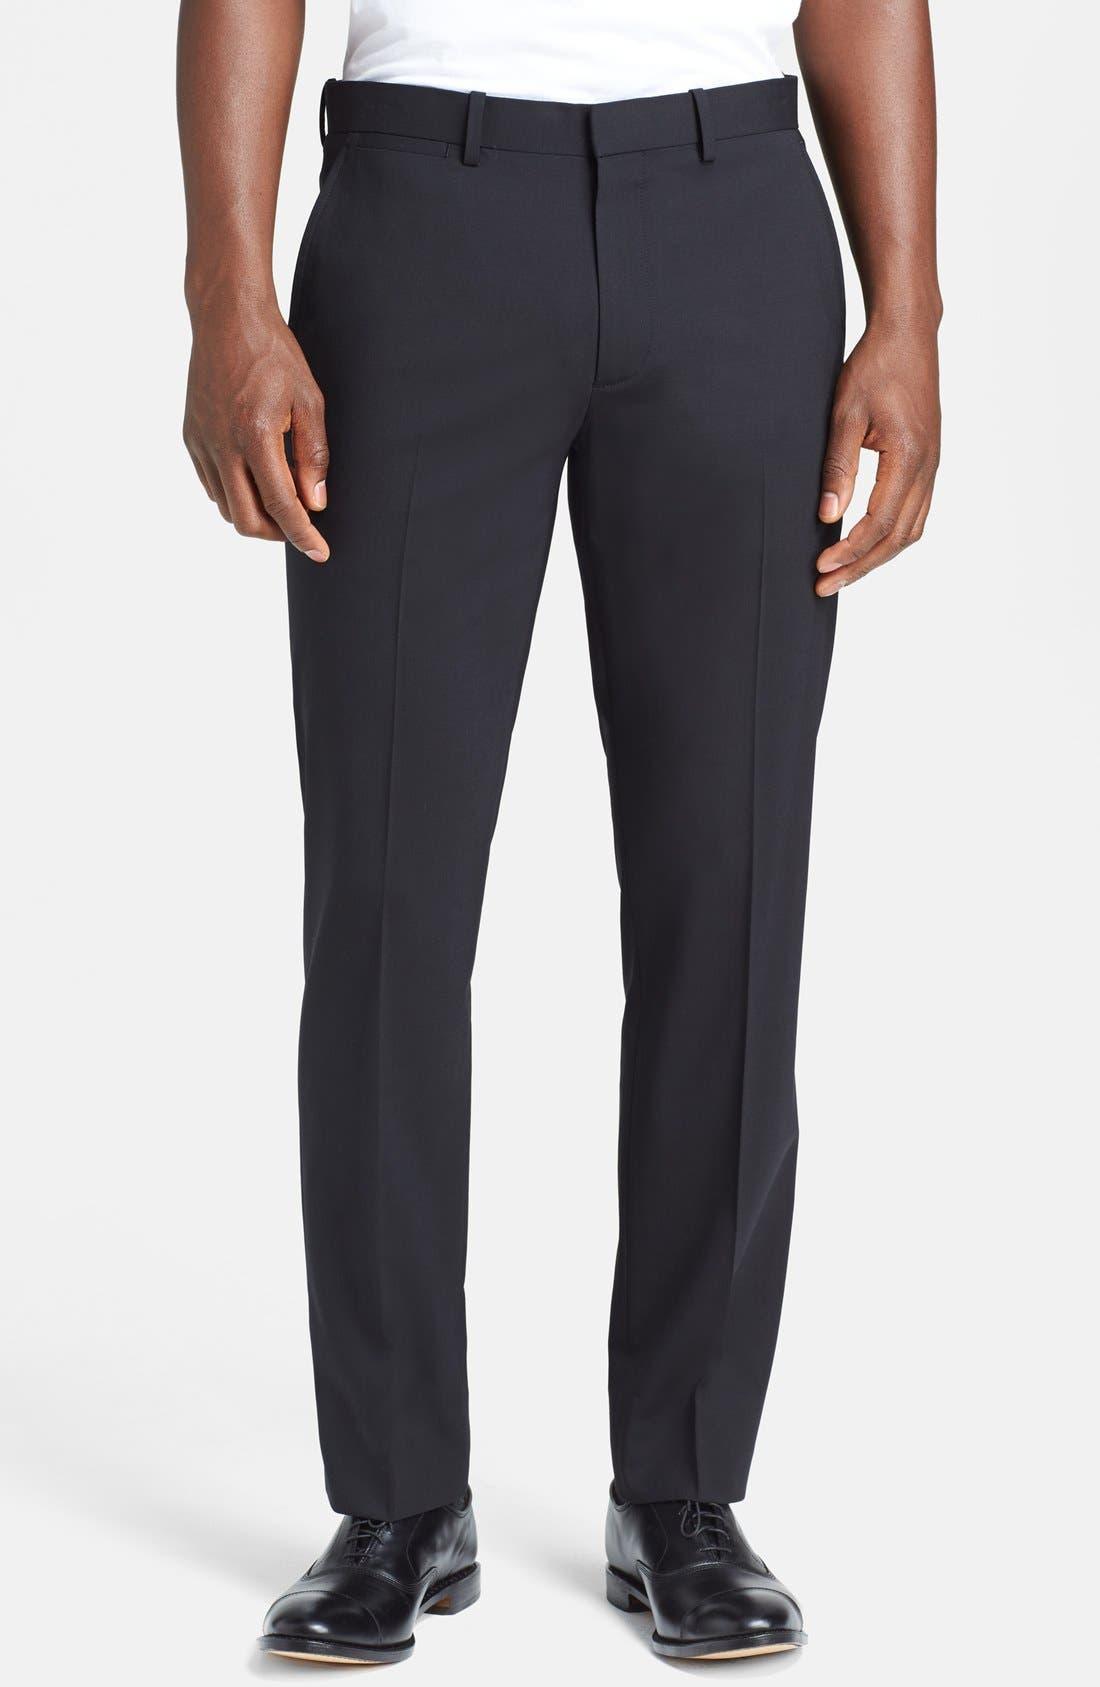 'Marlo New Tailor' Slim Fit Pants,                         Main,                         color, Black